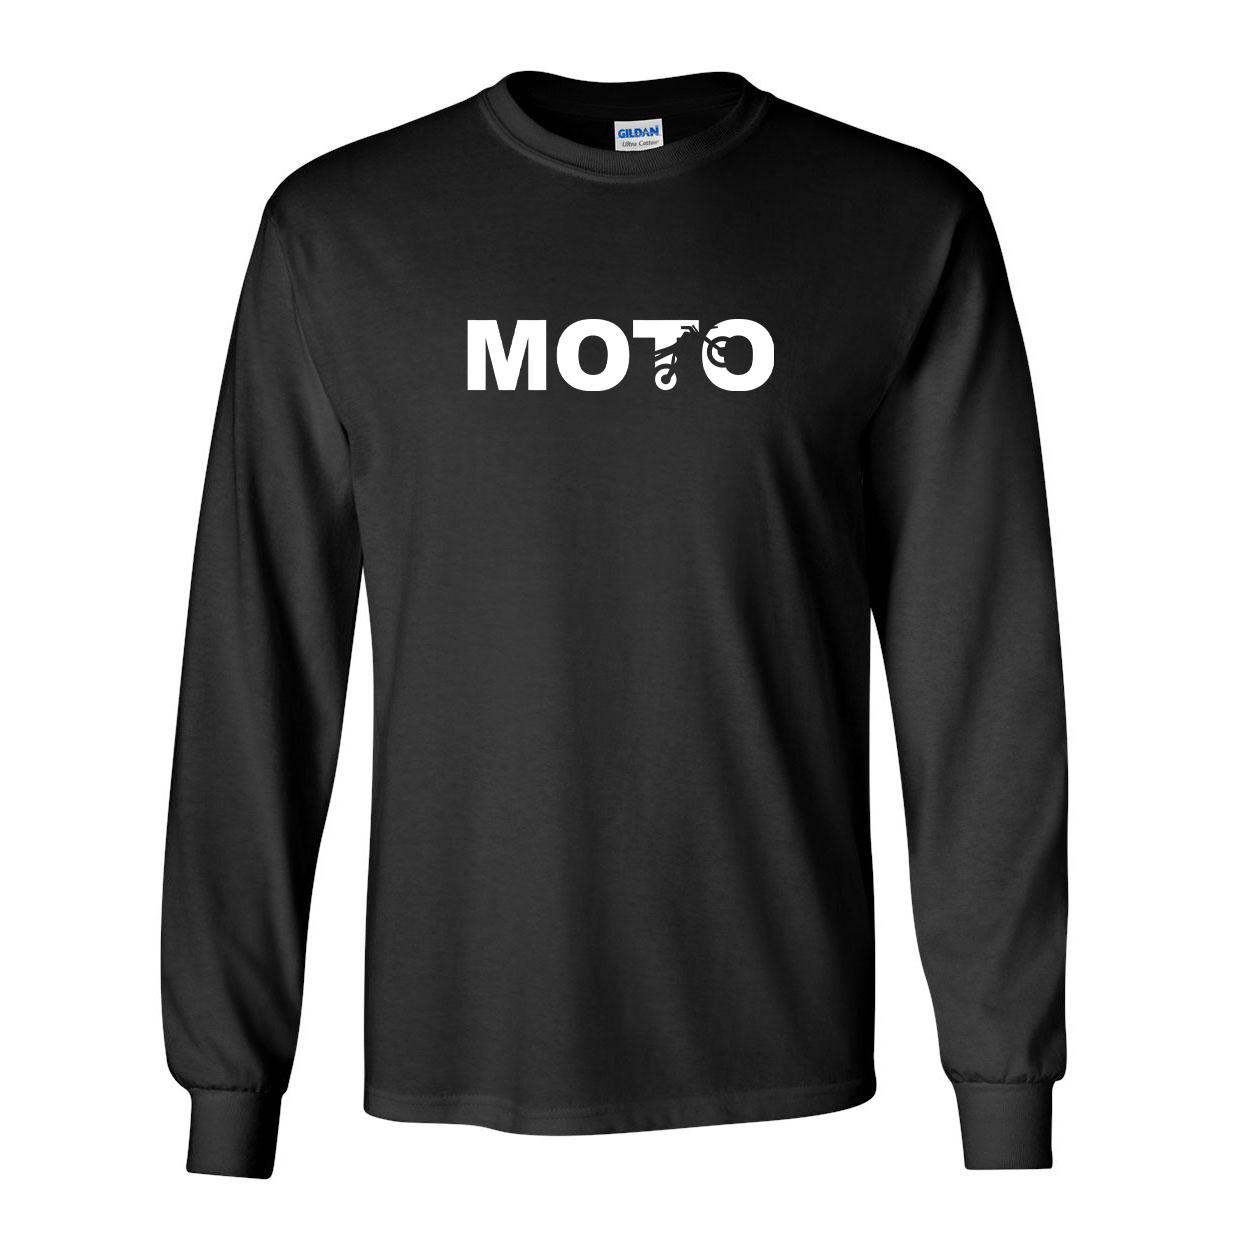 Moto Wheelie Logo Classic Long Sleeve T-Shirt Black (White Logo)